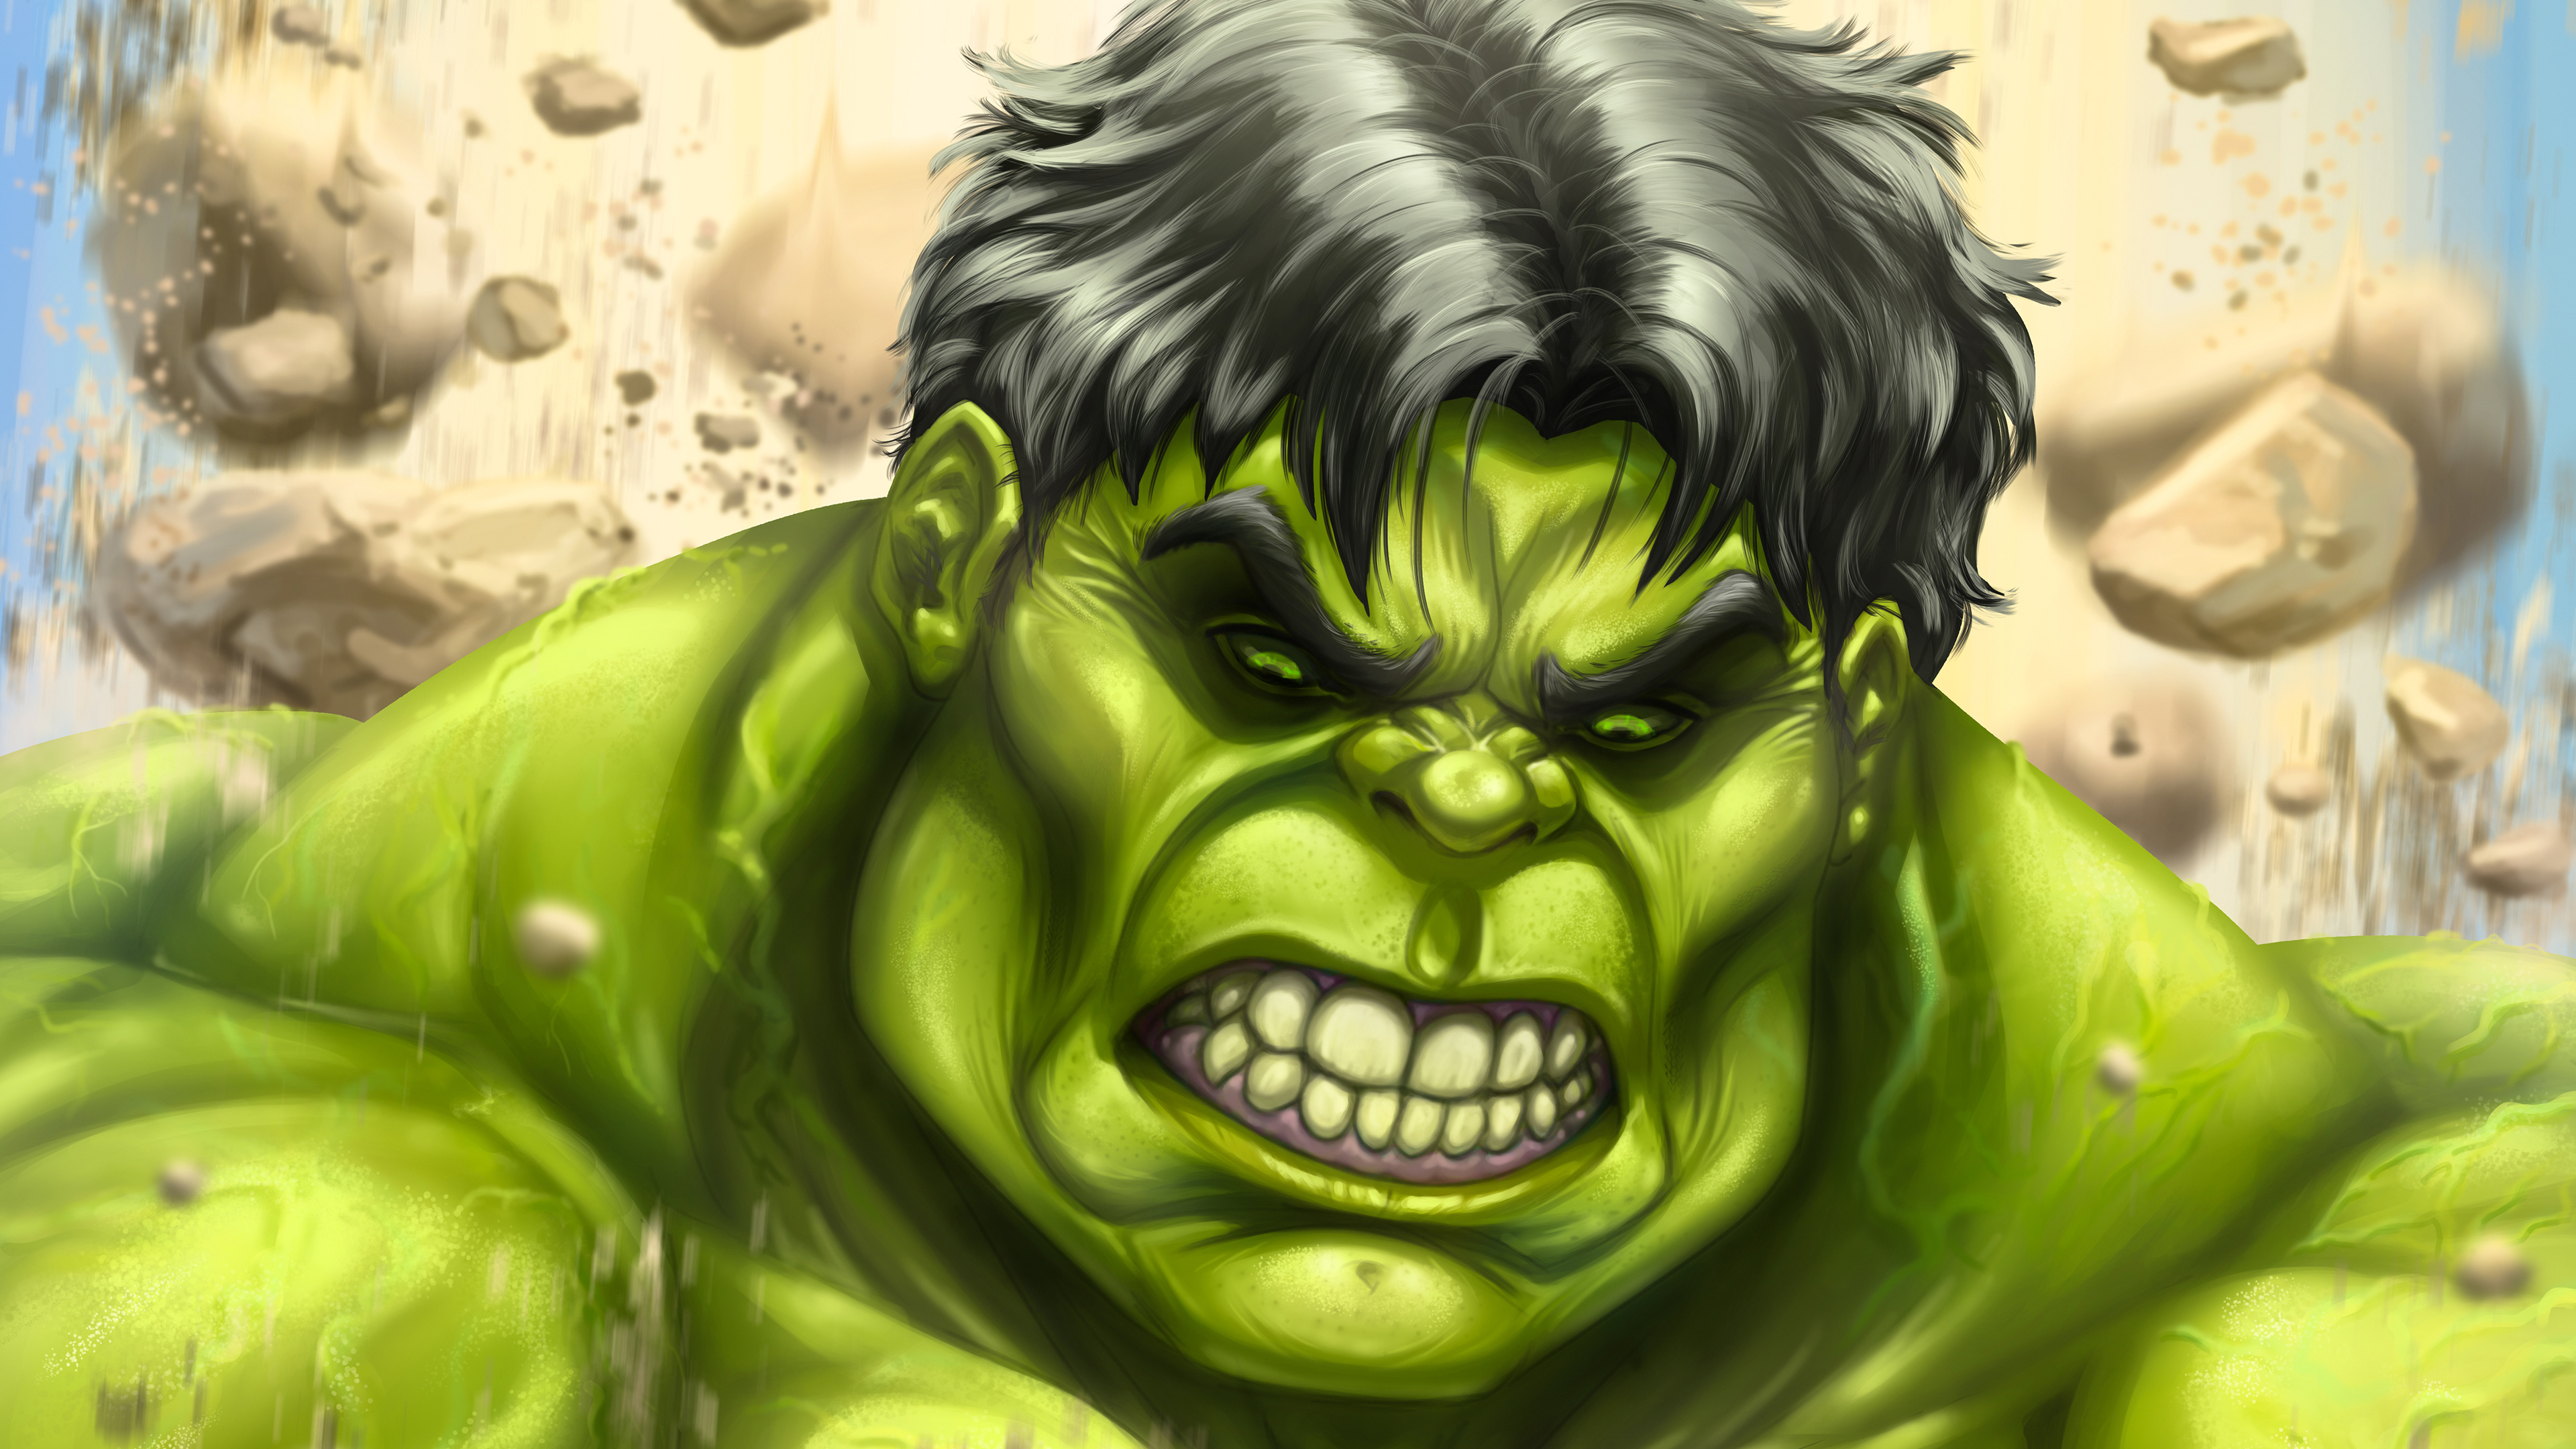 1600x1200 The Incredibles Hulk Art 4k 1600x1200 Resolution